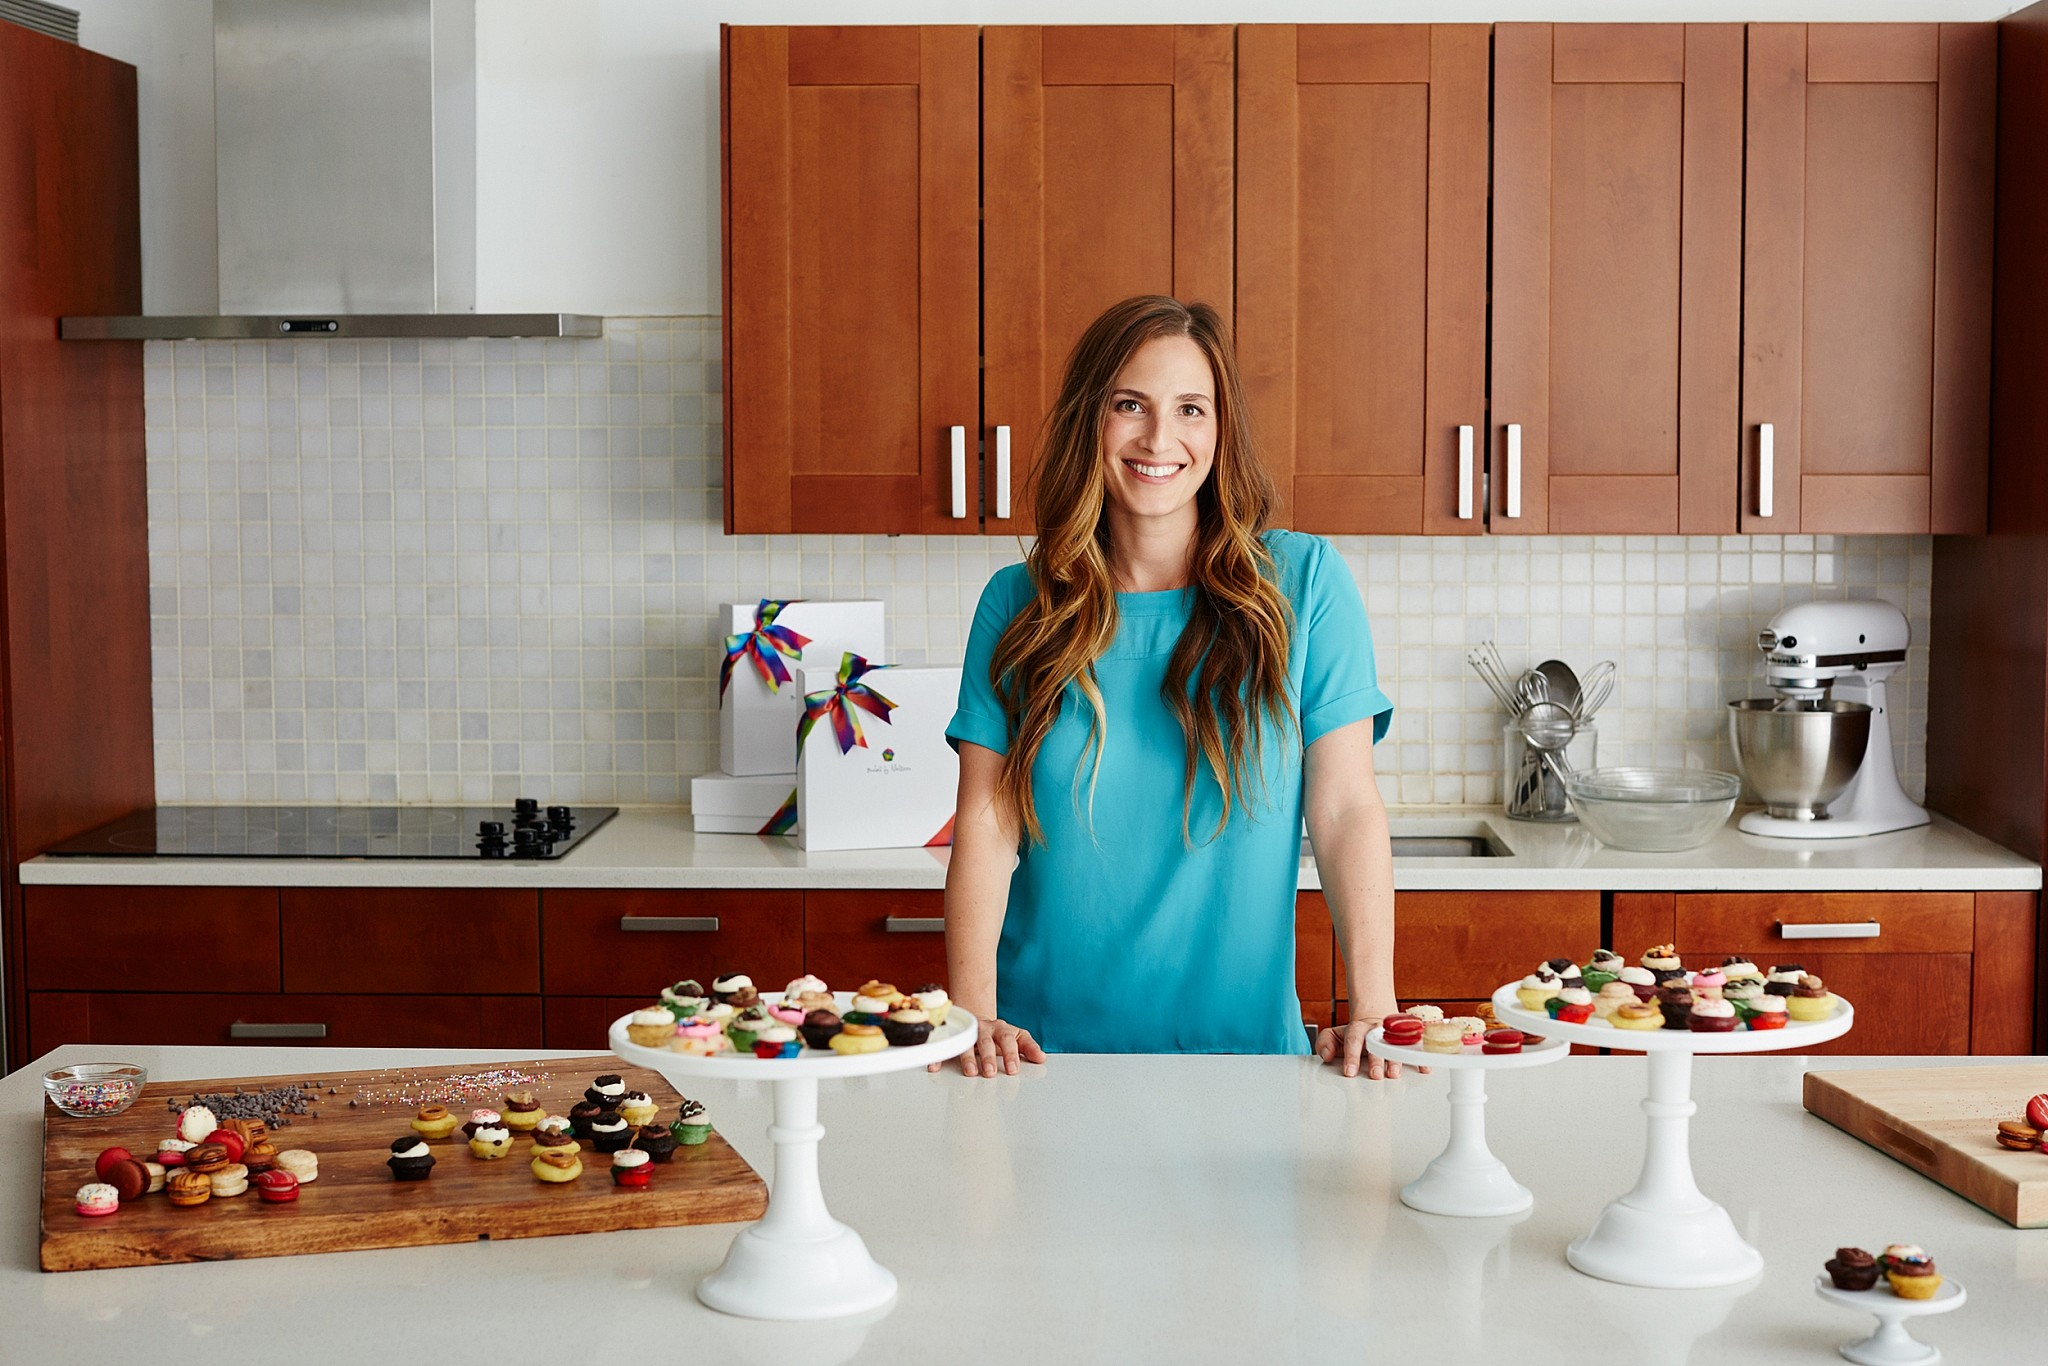 Melissa Ben-Ishay of Baked by Melissa. (Courtesy)